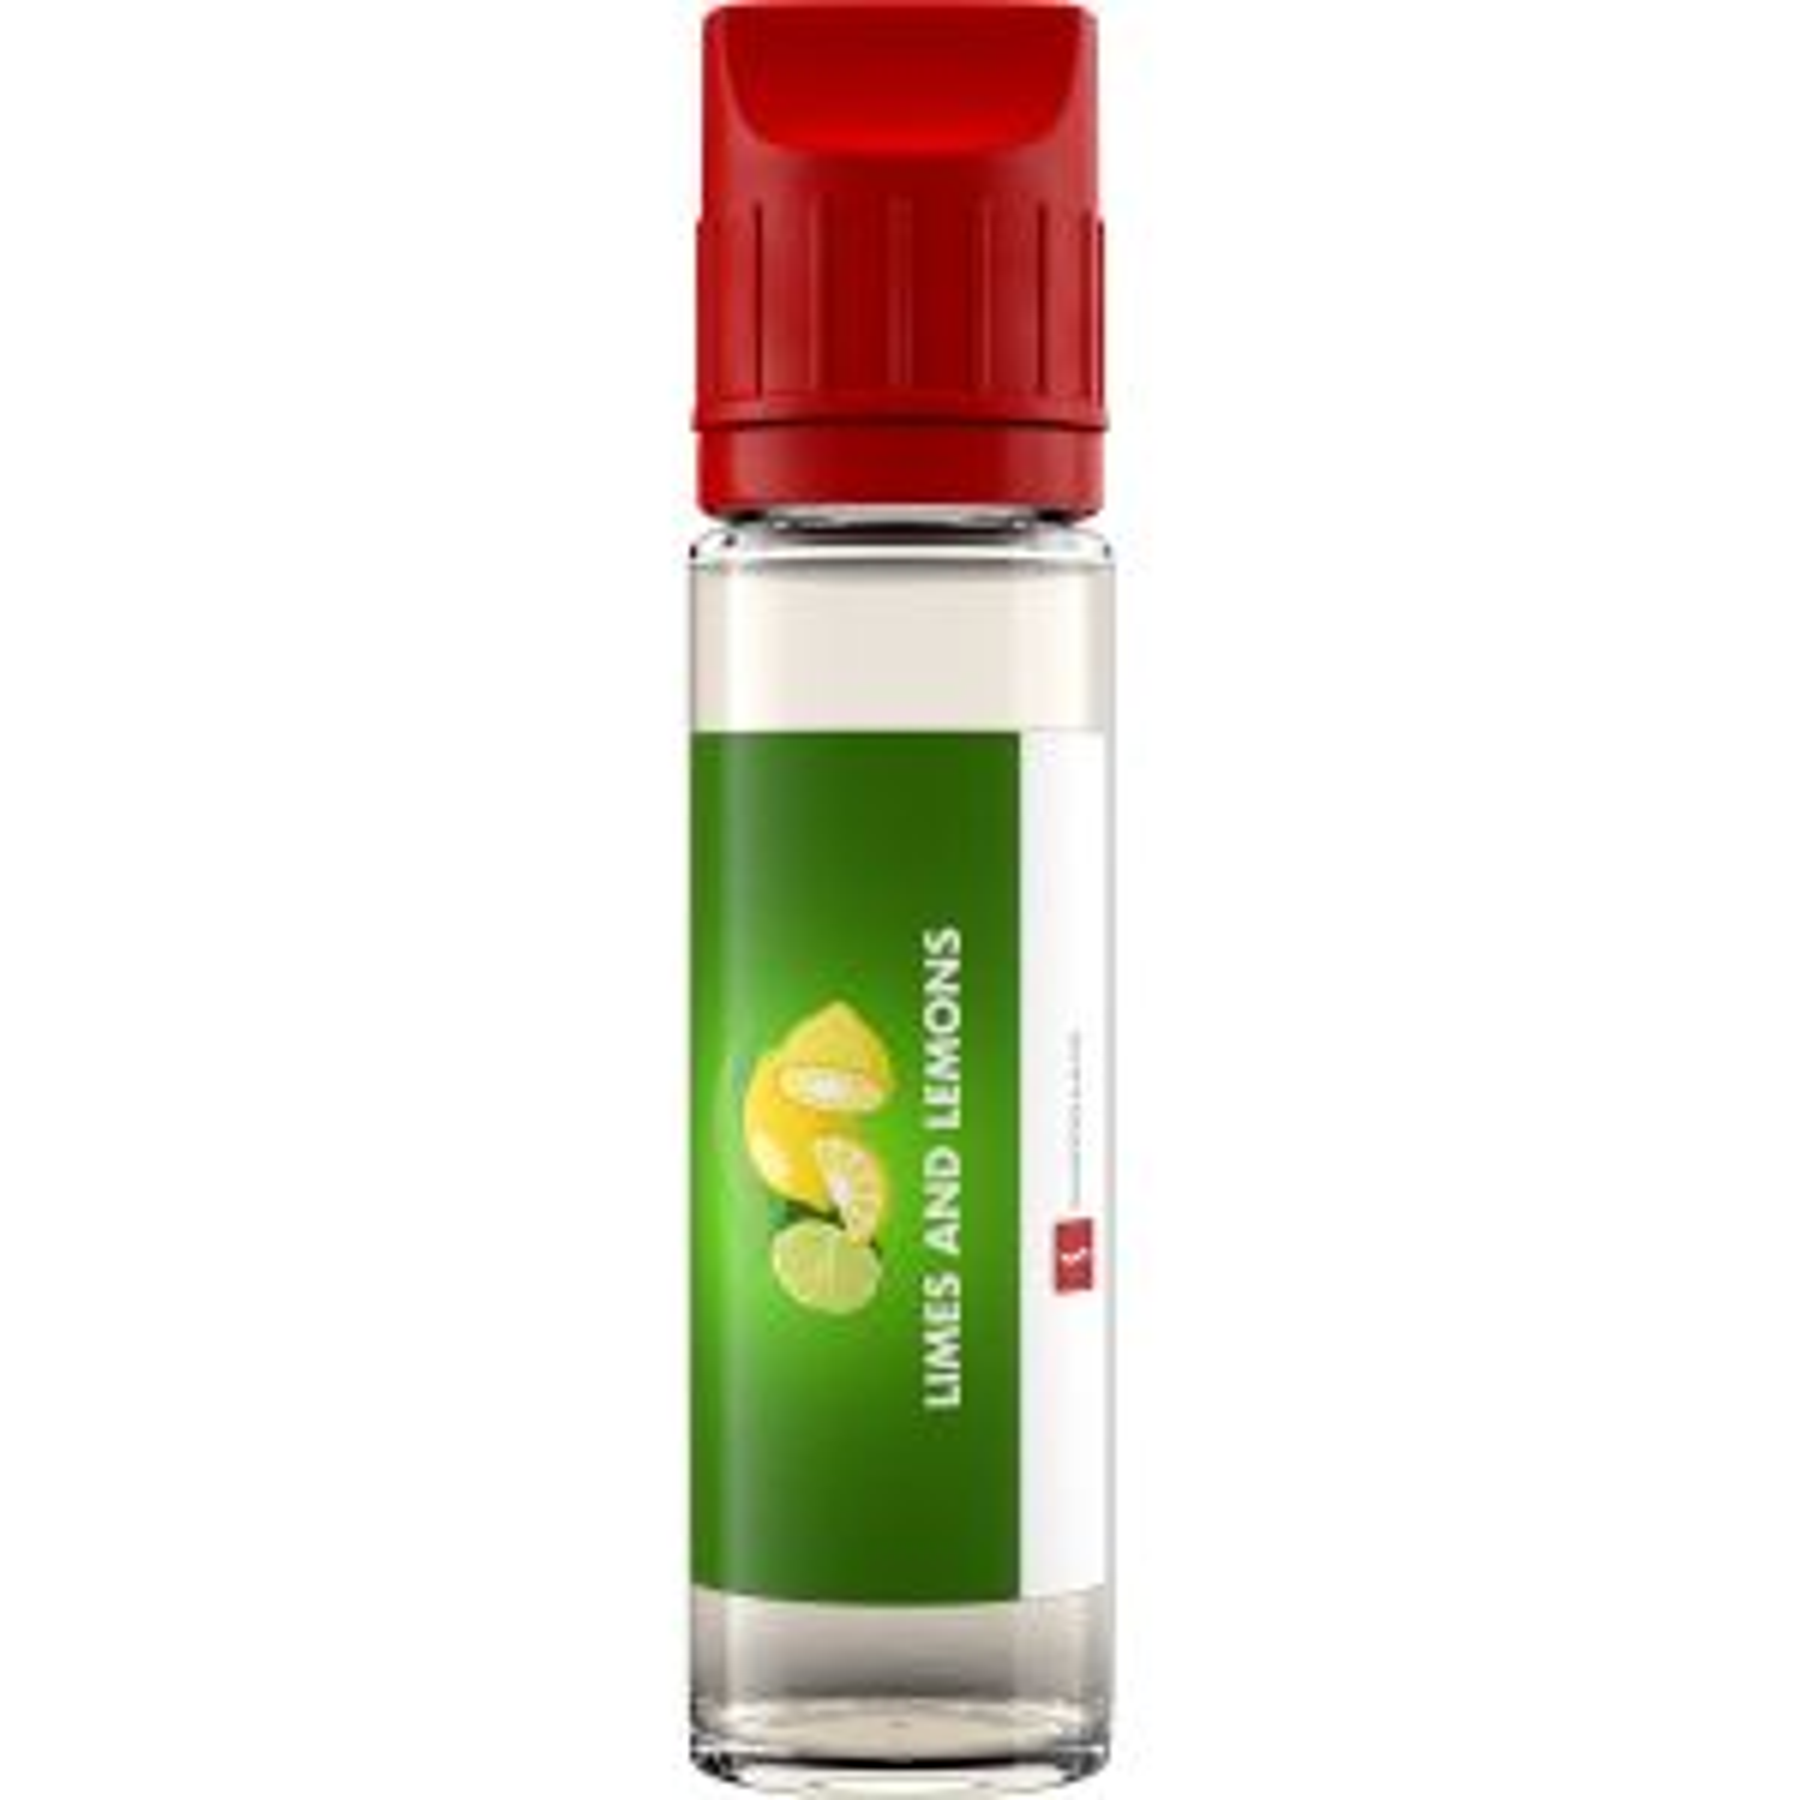 Skoddejuice Limes and Lemons